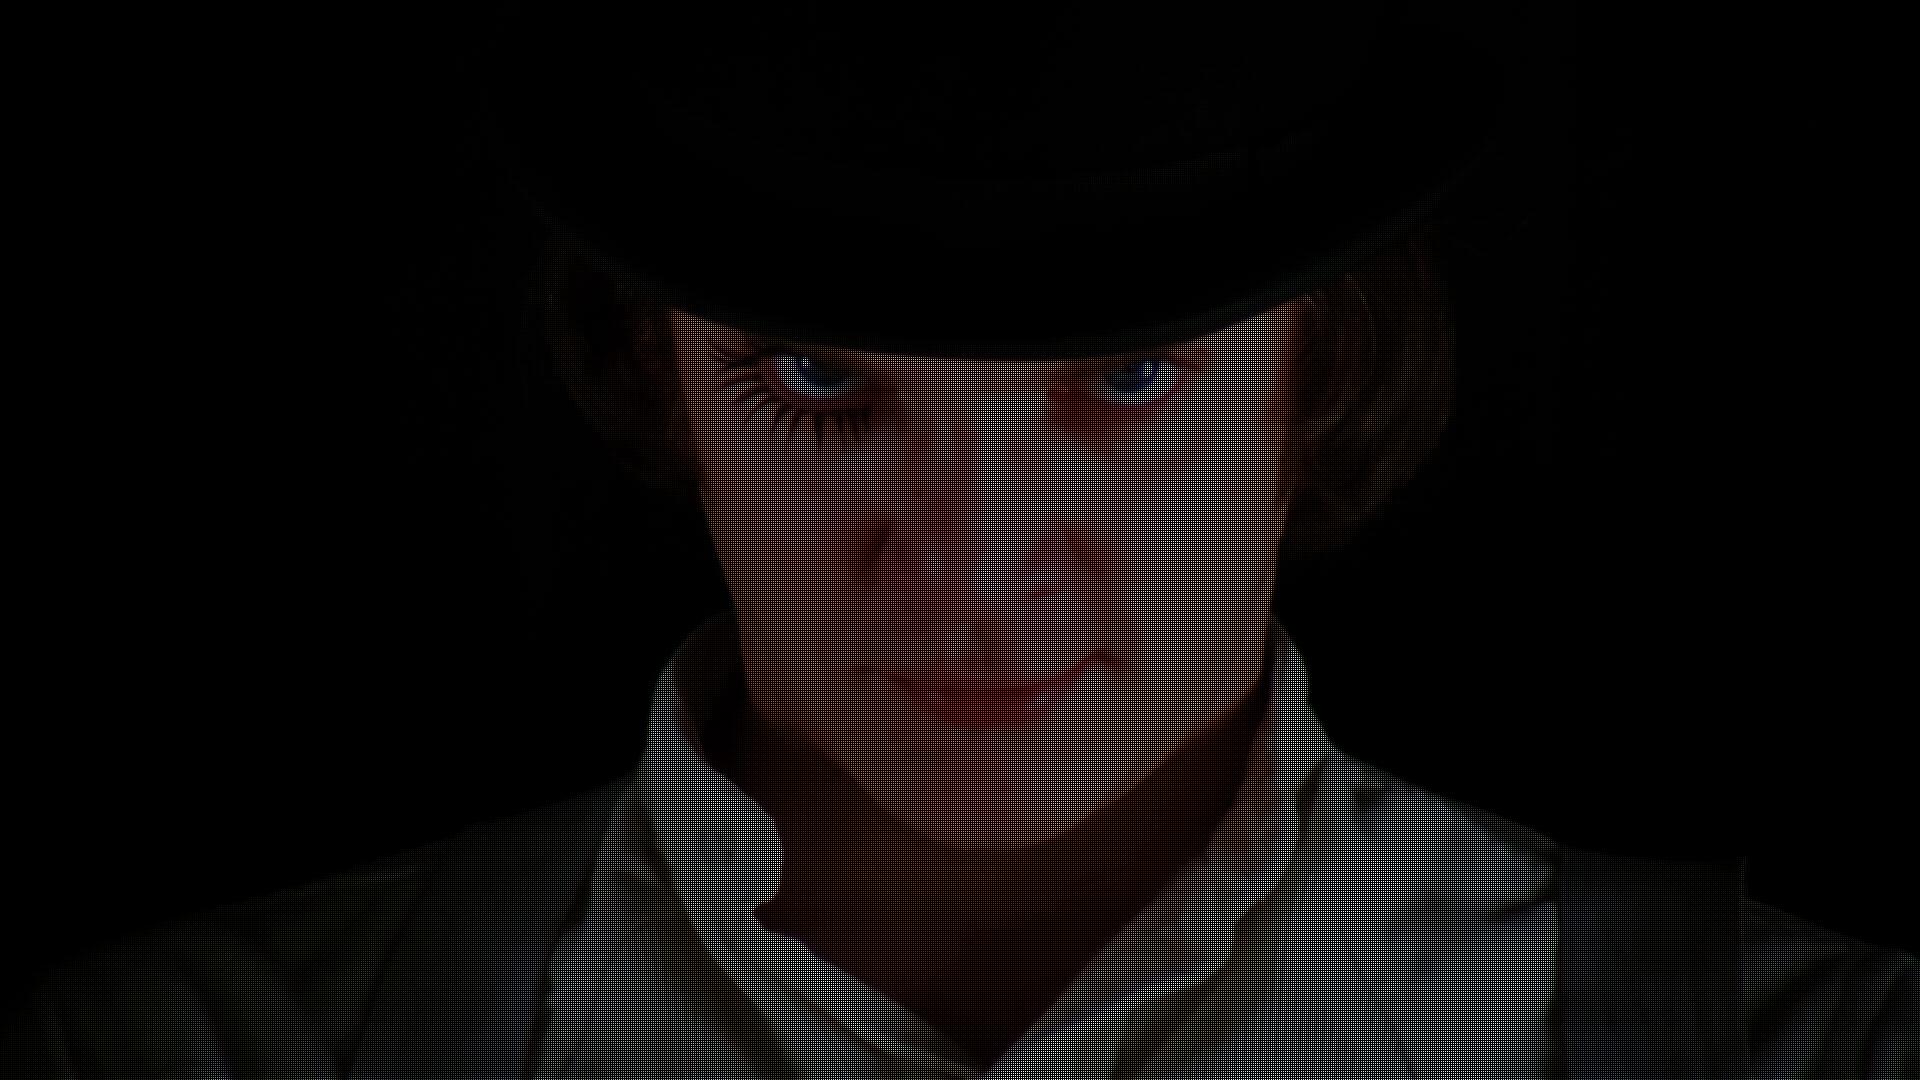 Wallpaper Movies A Clockwork Orange Malcolm Mcdowell